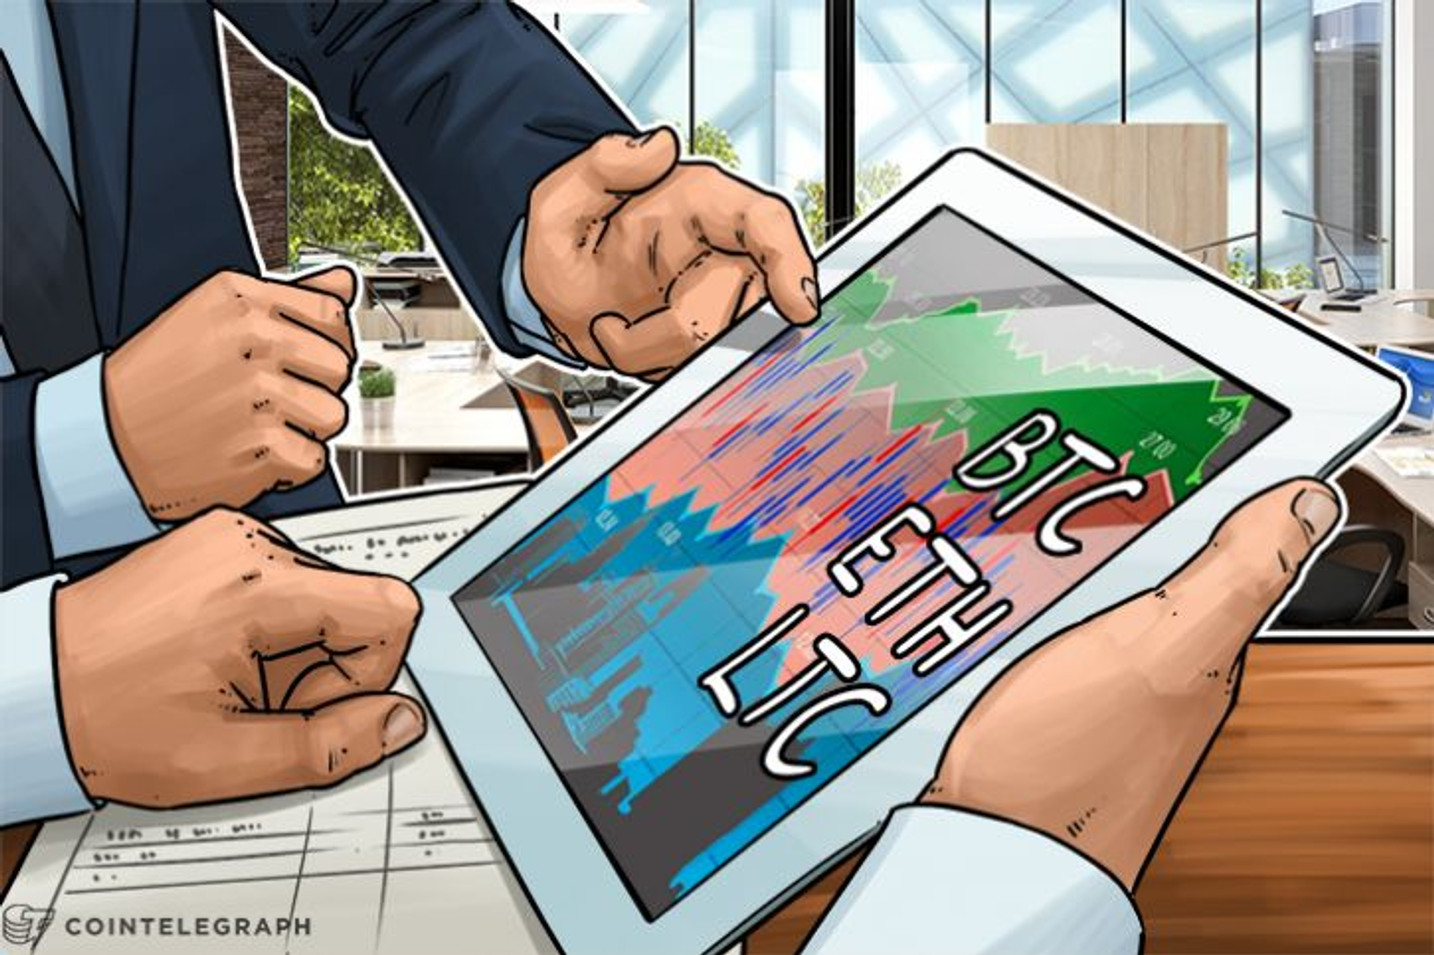 Analiza cena, 2. novembar: Bitkoin (BTC), Itirijum (ETH), Lajtkoin (LTC)